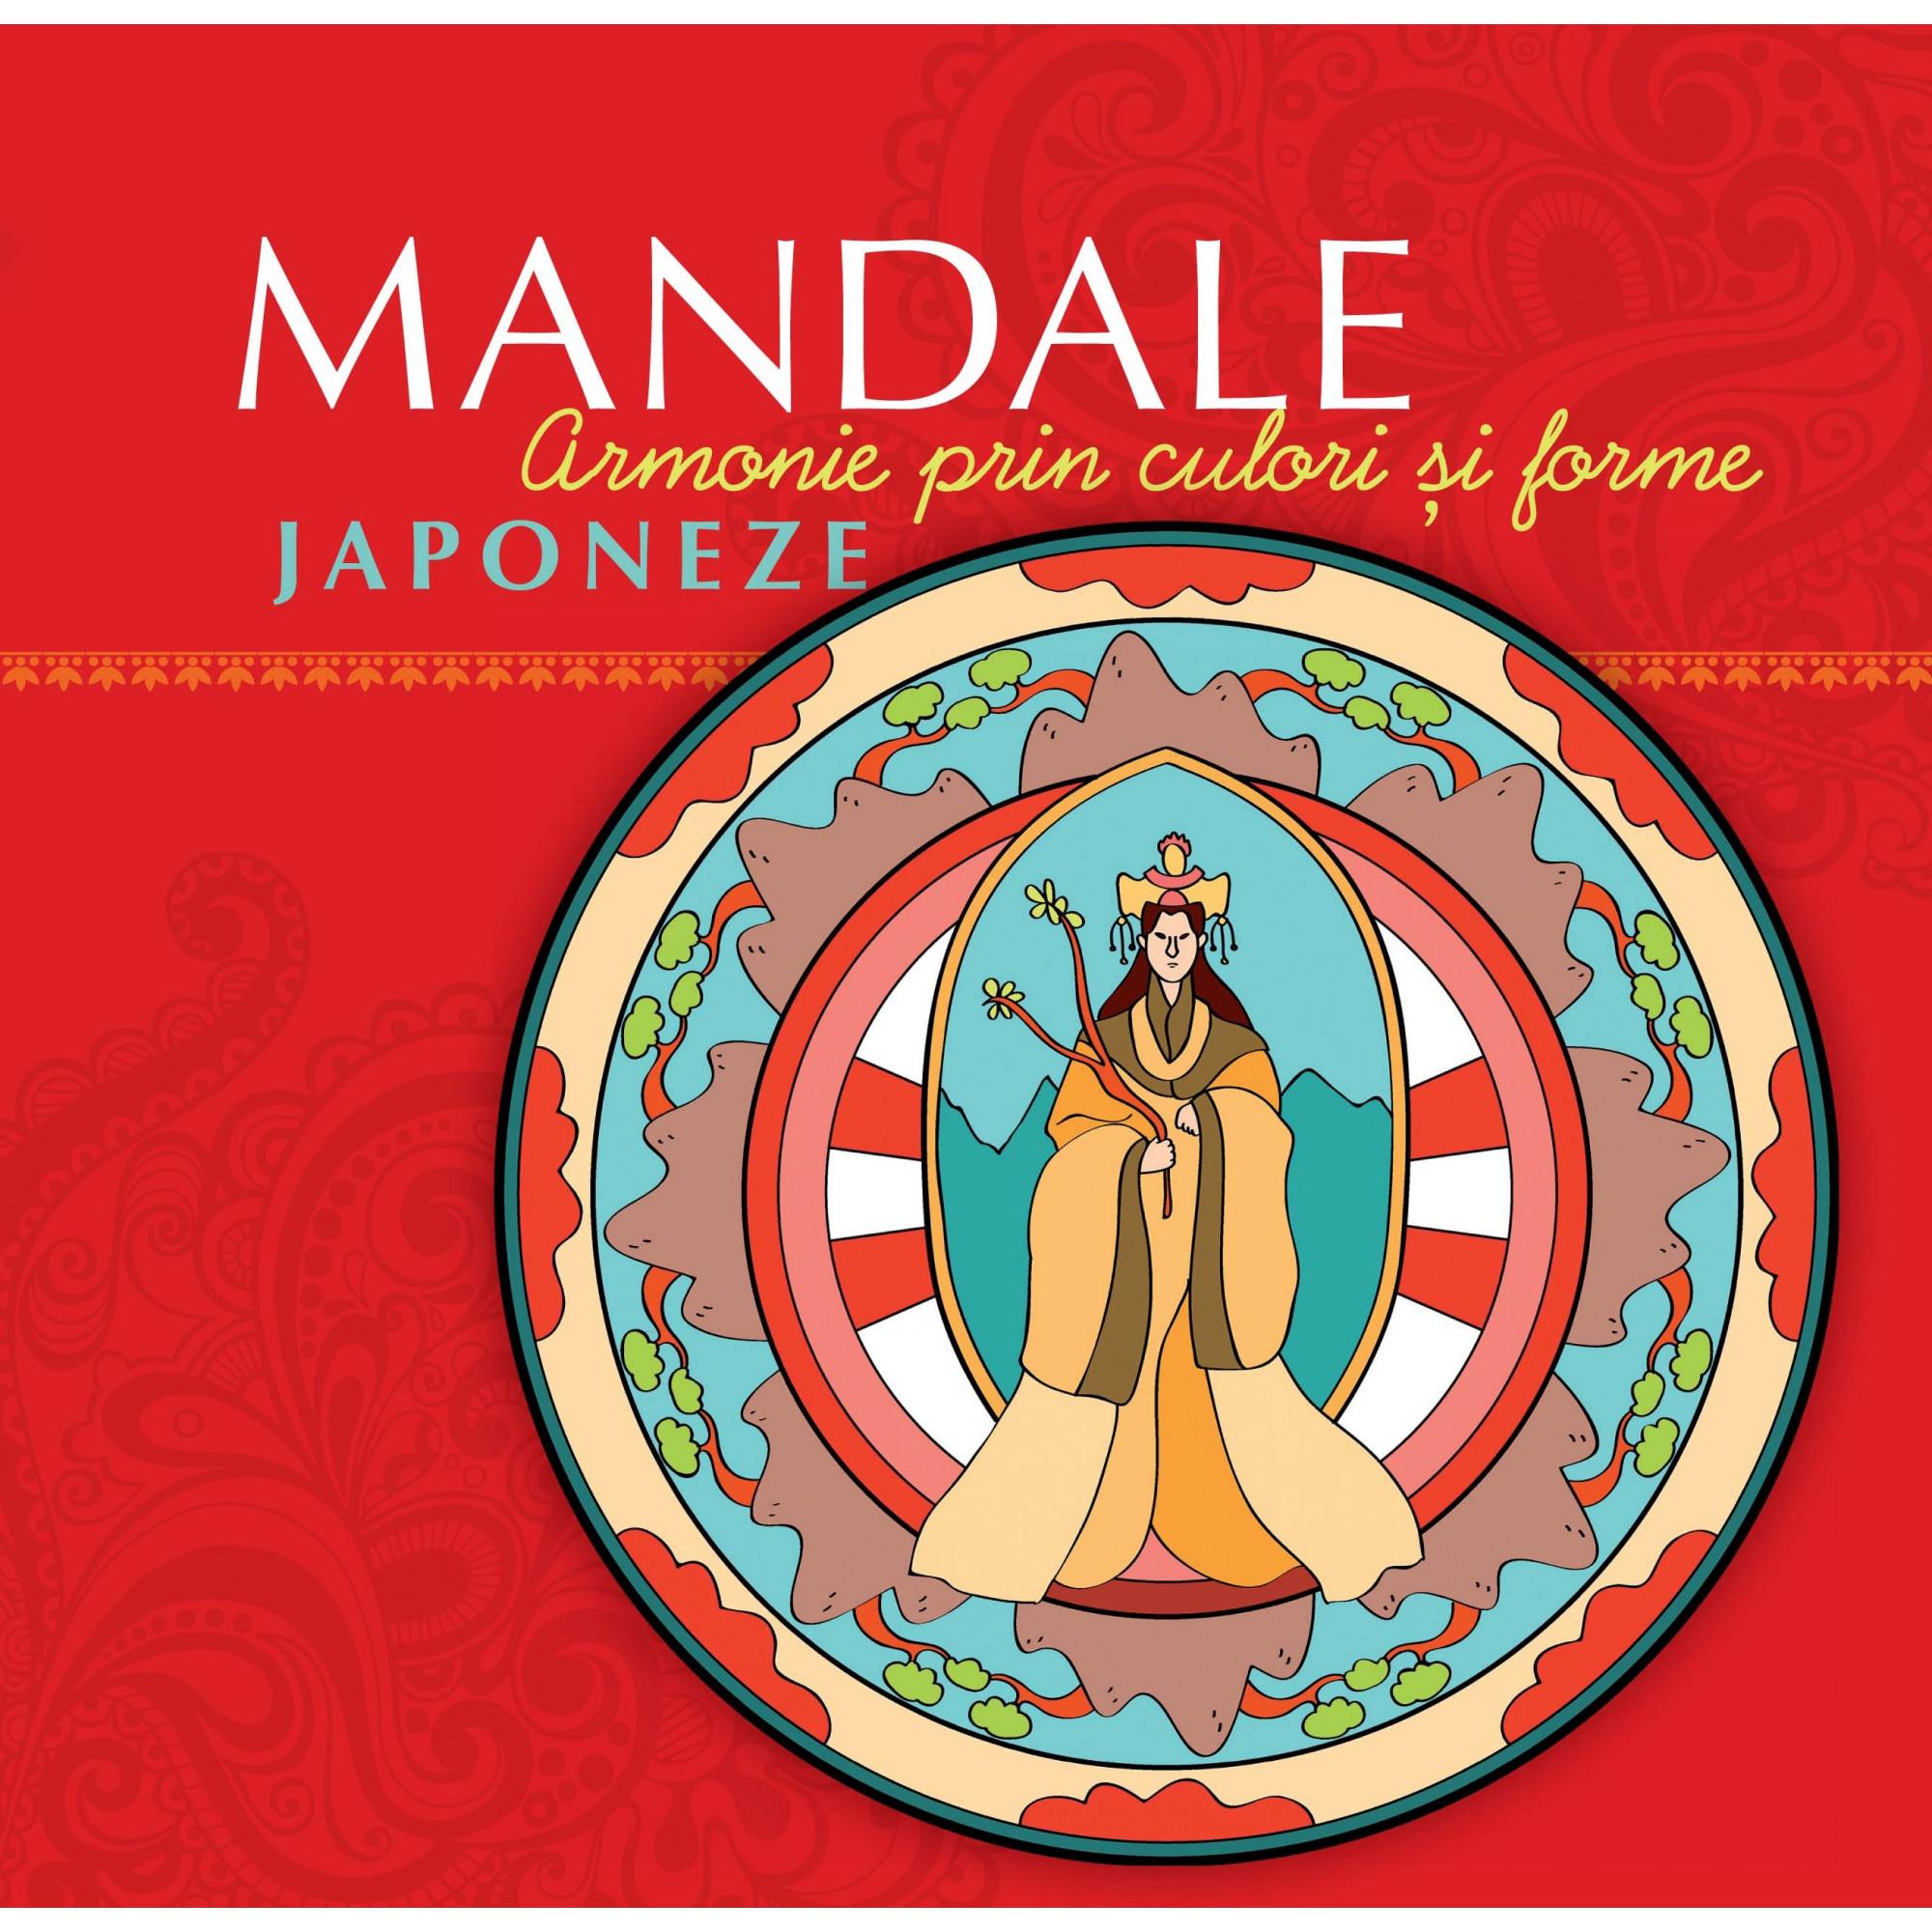 Mandale japoneze. Armonie prin culori și forme